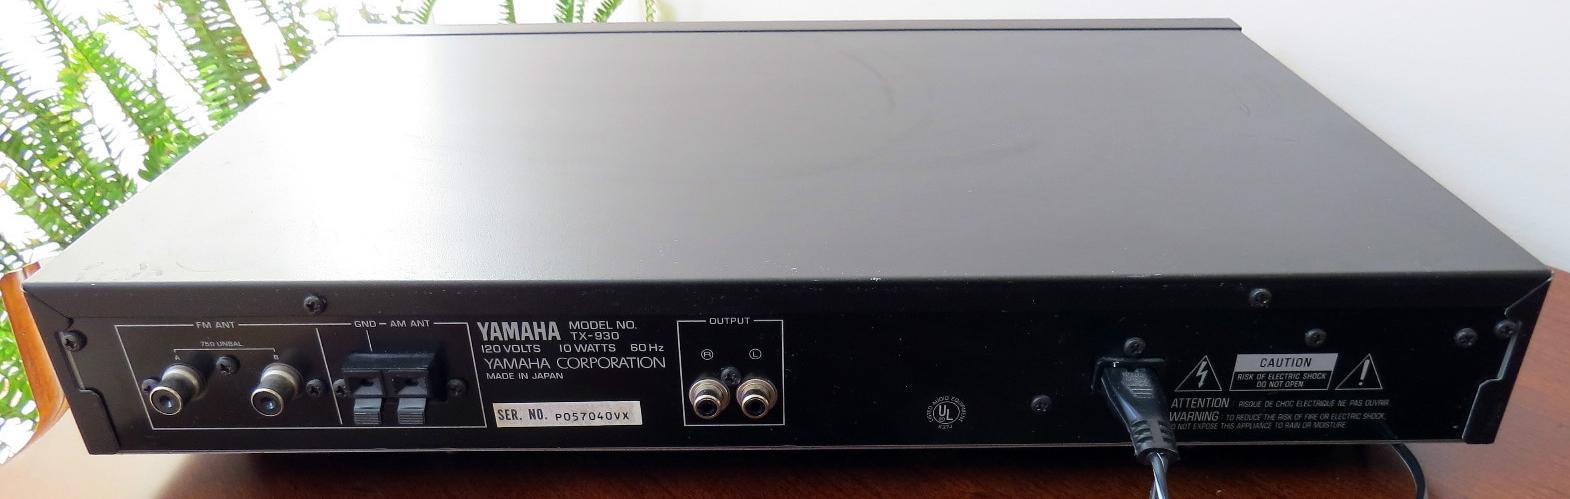 Tuner Information Center - Yamaha Tuners